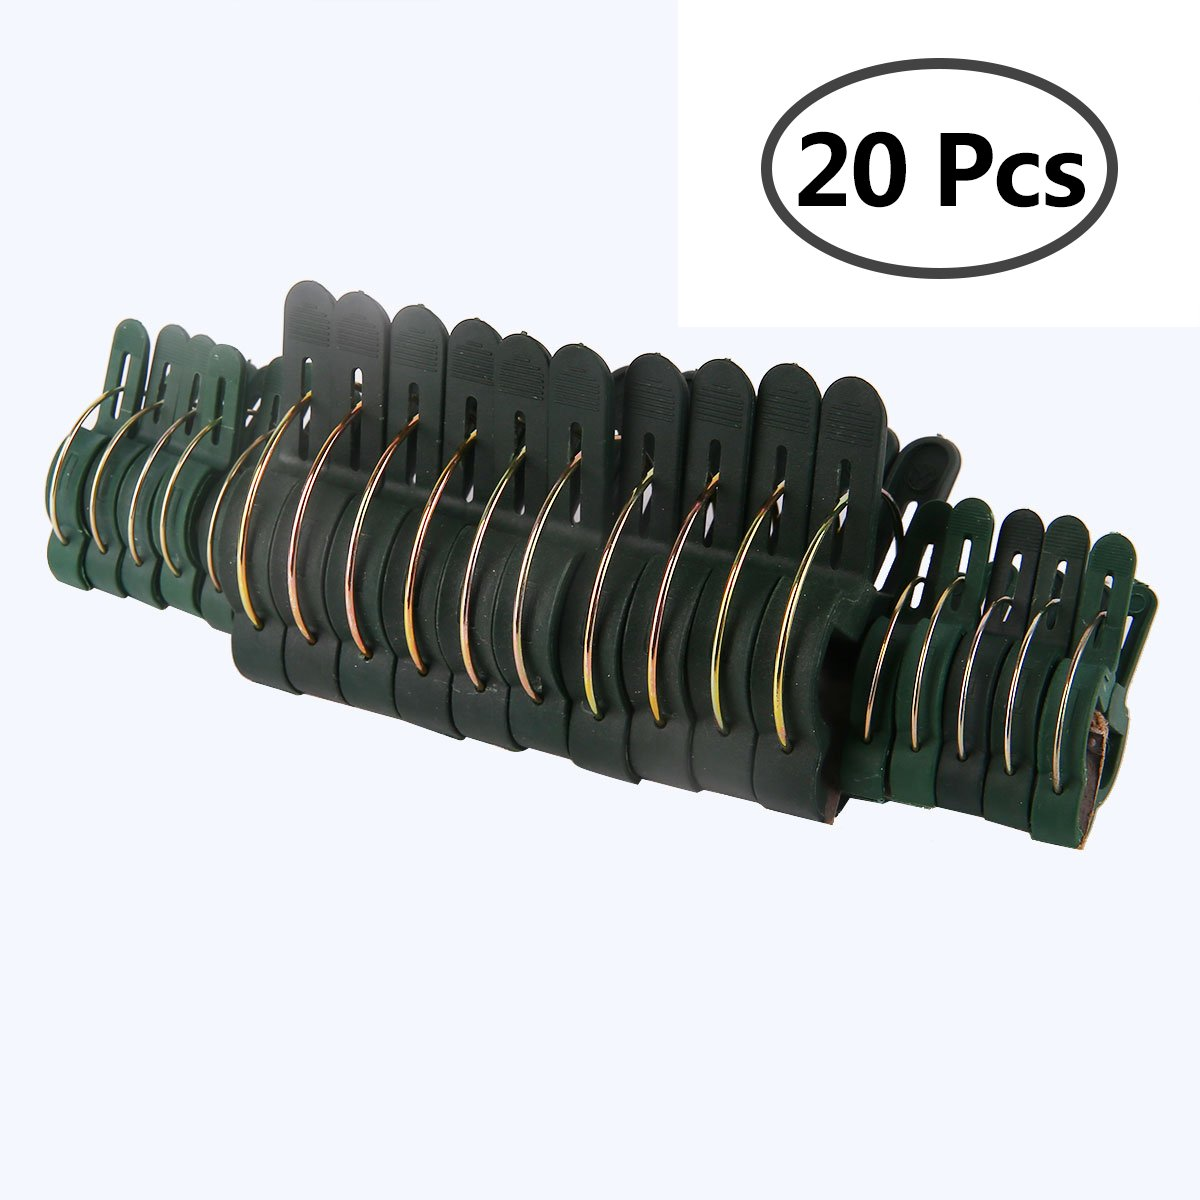 Freebily Garden Plant Clips, Support Plant Clip Flower Lever Loop Gripper Clips Tools for Vine Garden Vegetables Tomatoes 20PCS Multi